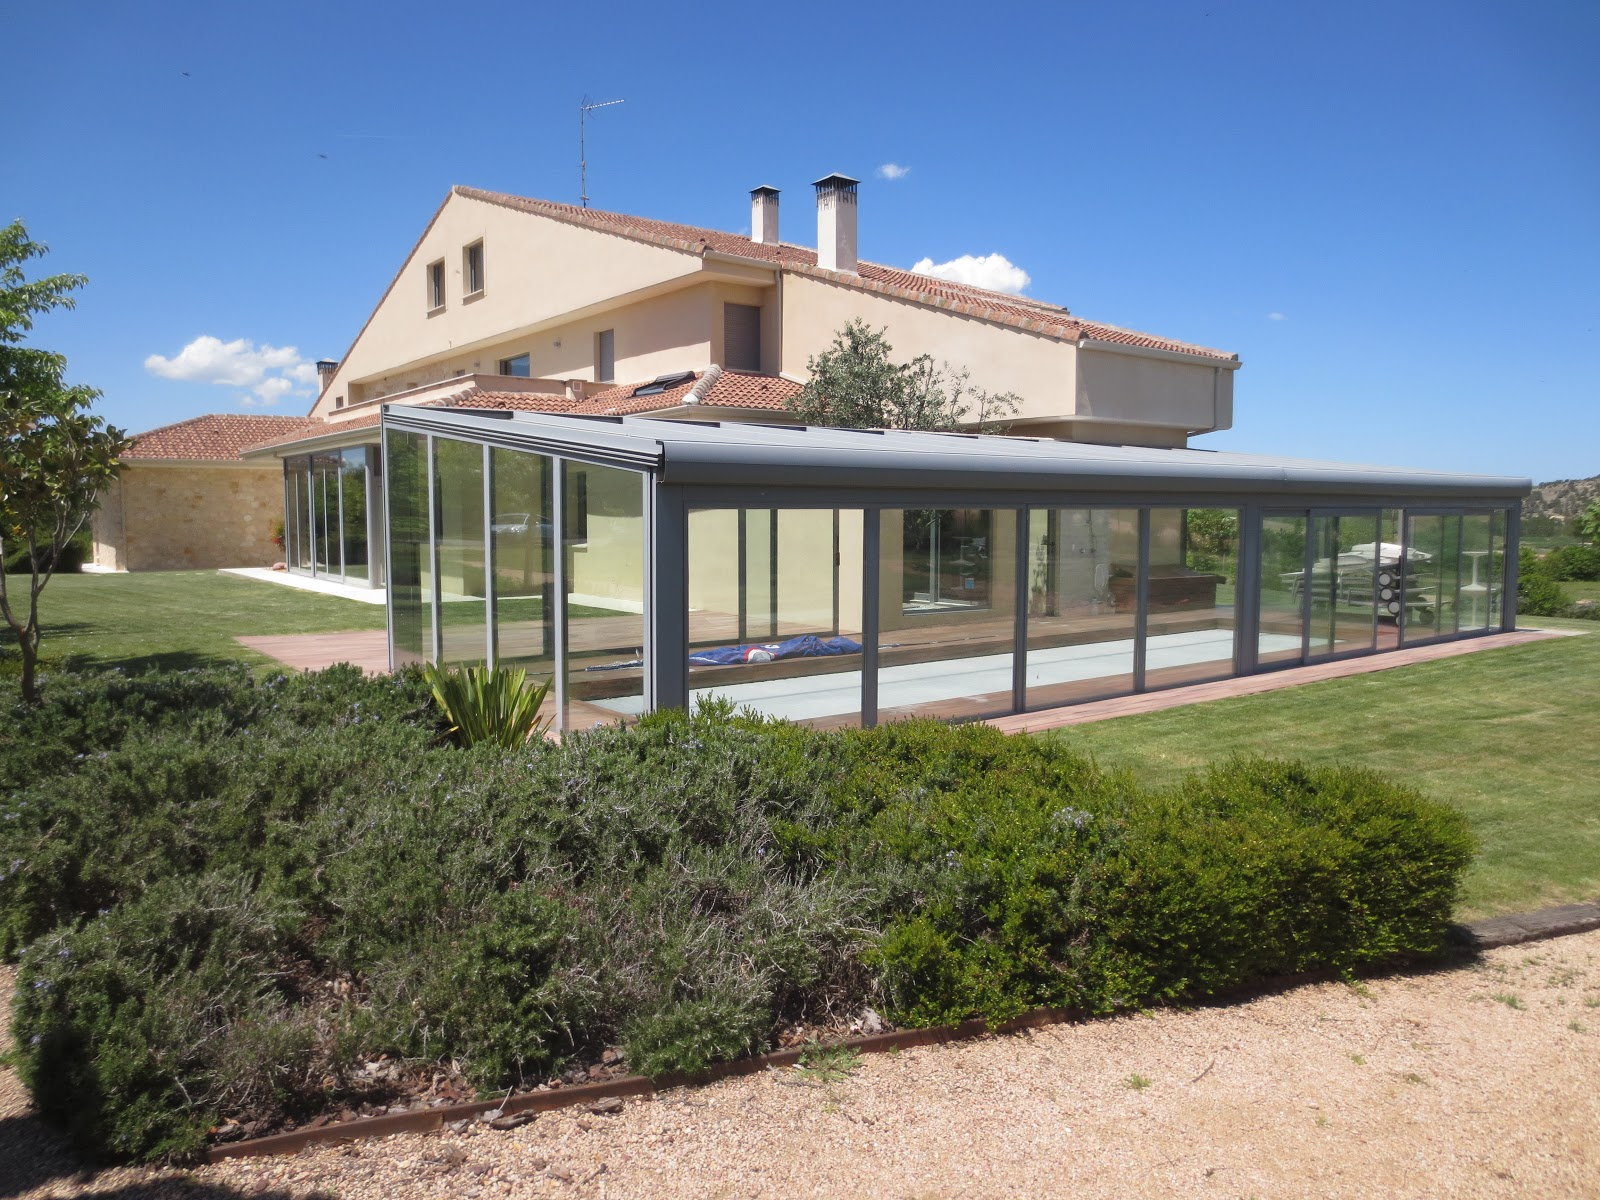 El talon sierte construcci n en segovia placas solares - Climatizar piscina exterior ...